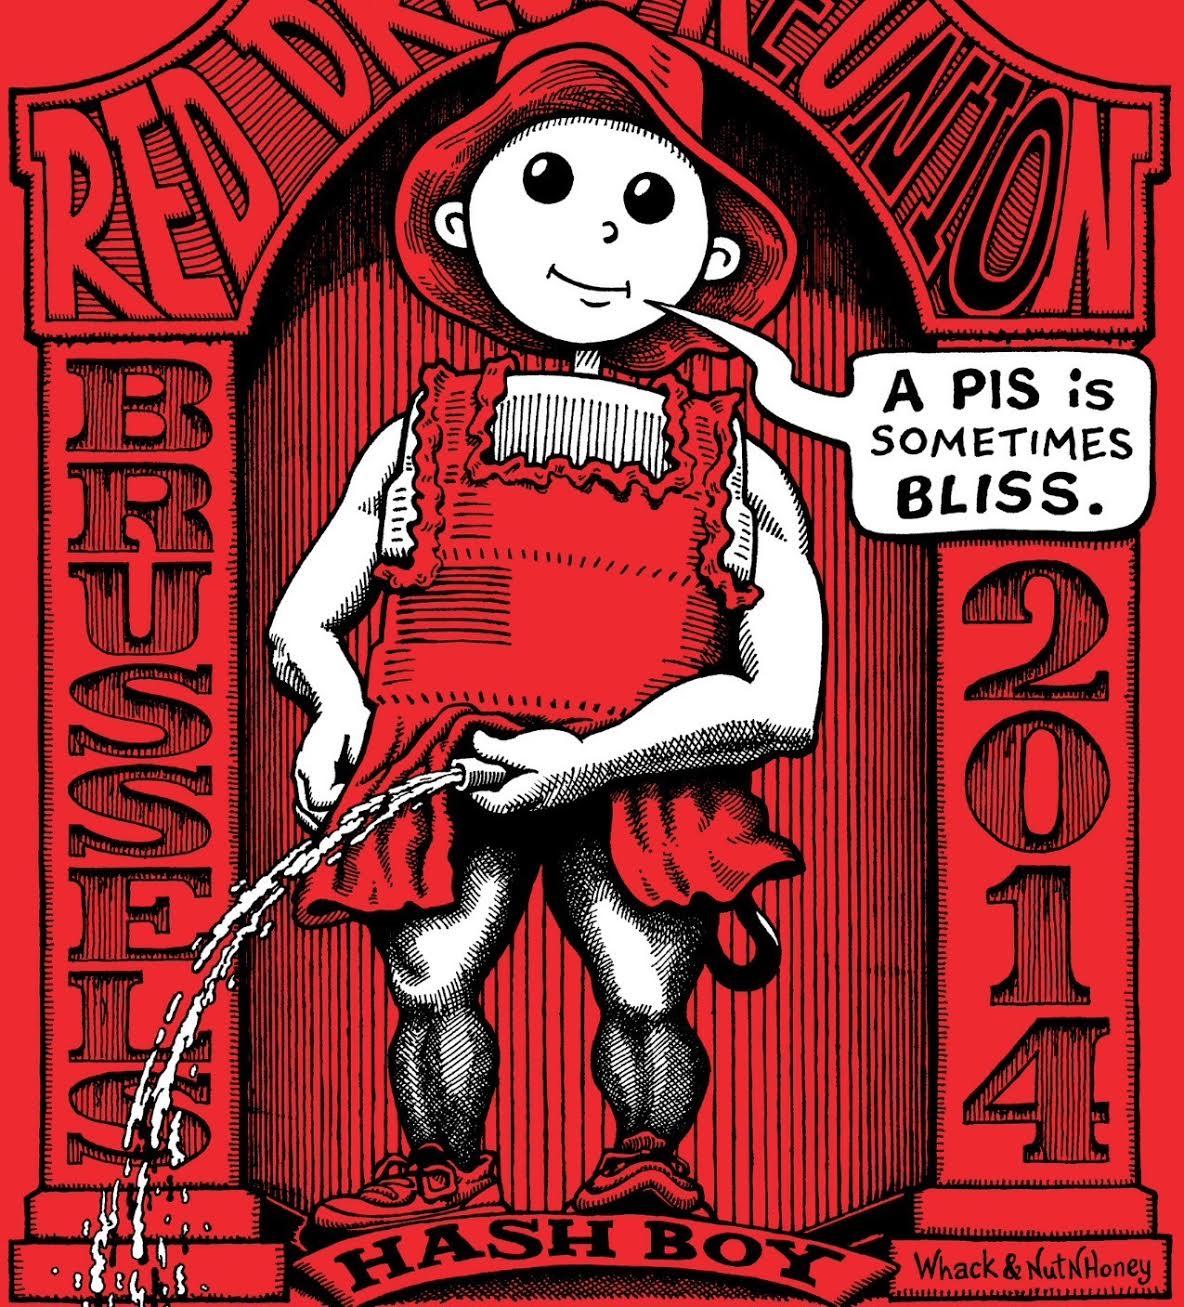 Hash Boy Brussels Red Dress (2014) Tee